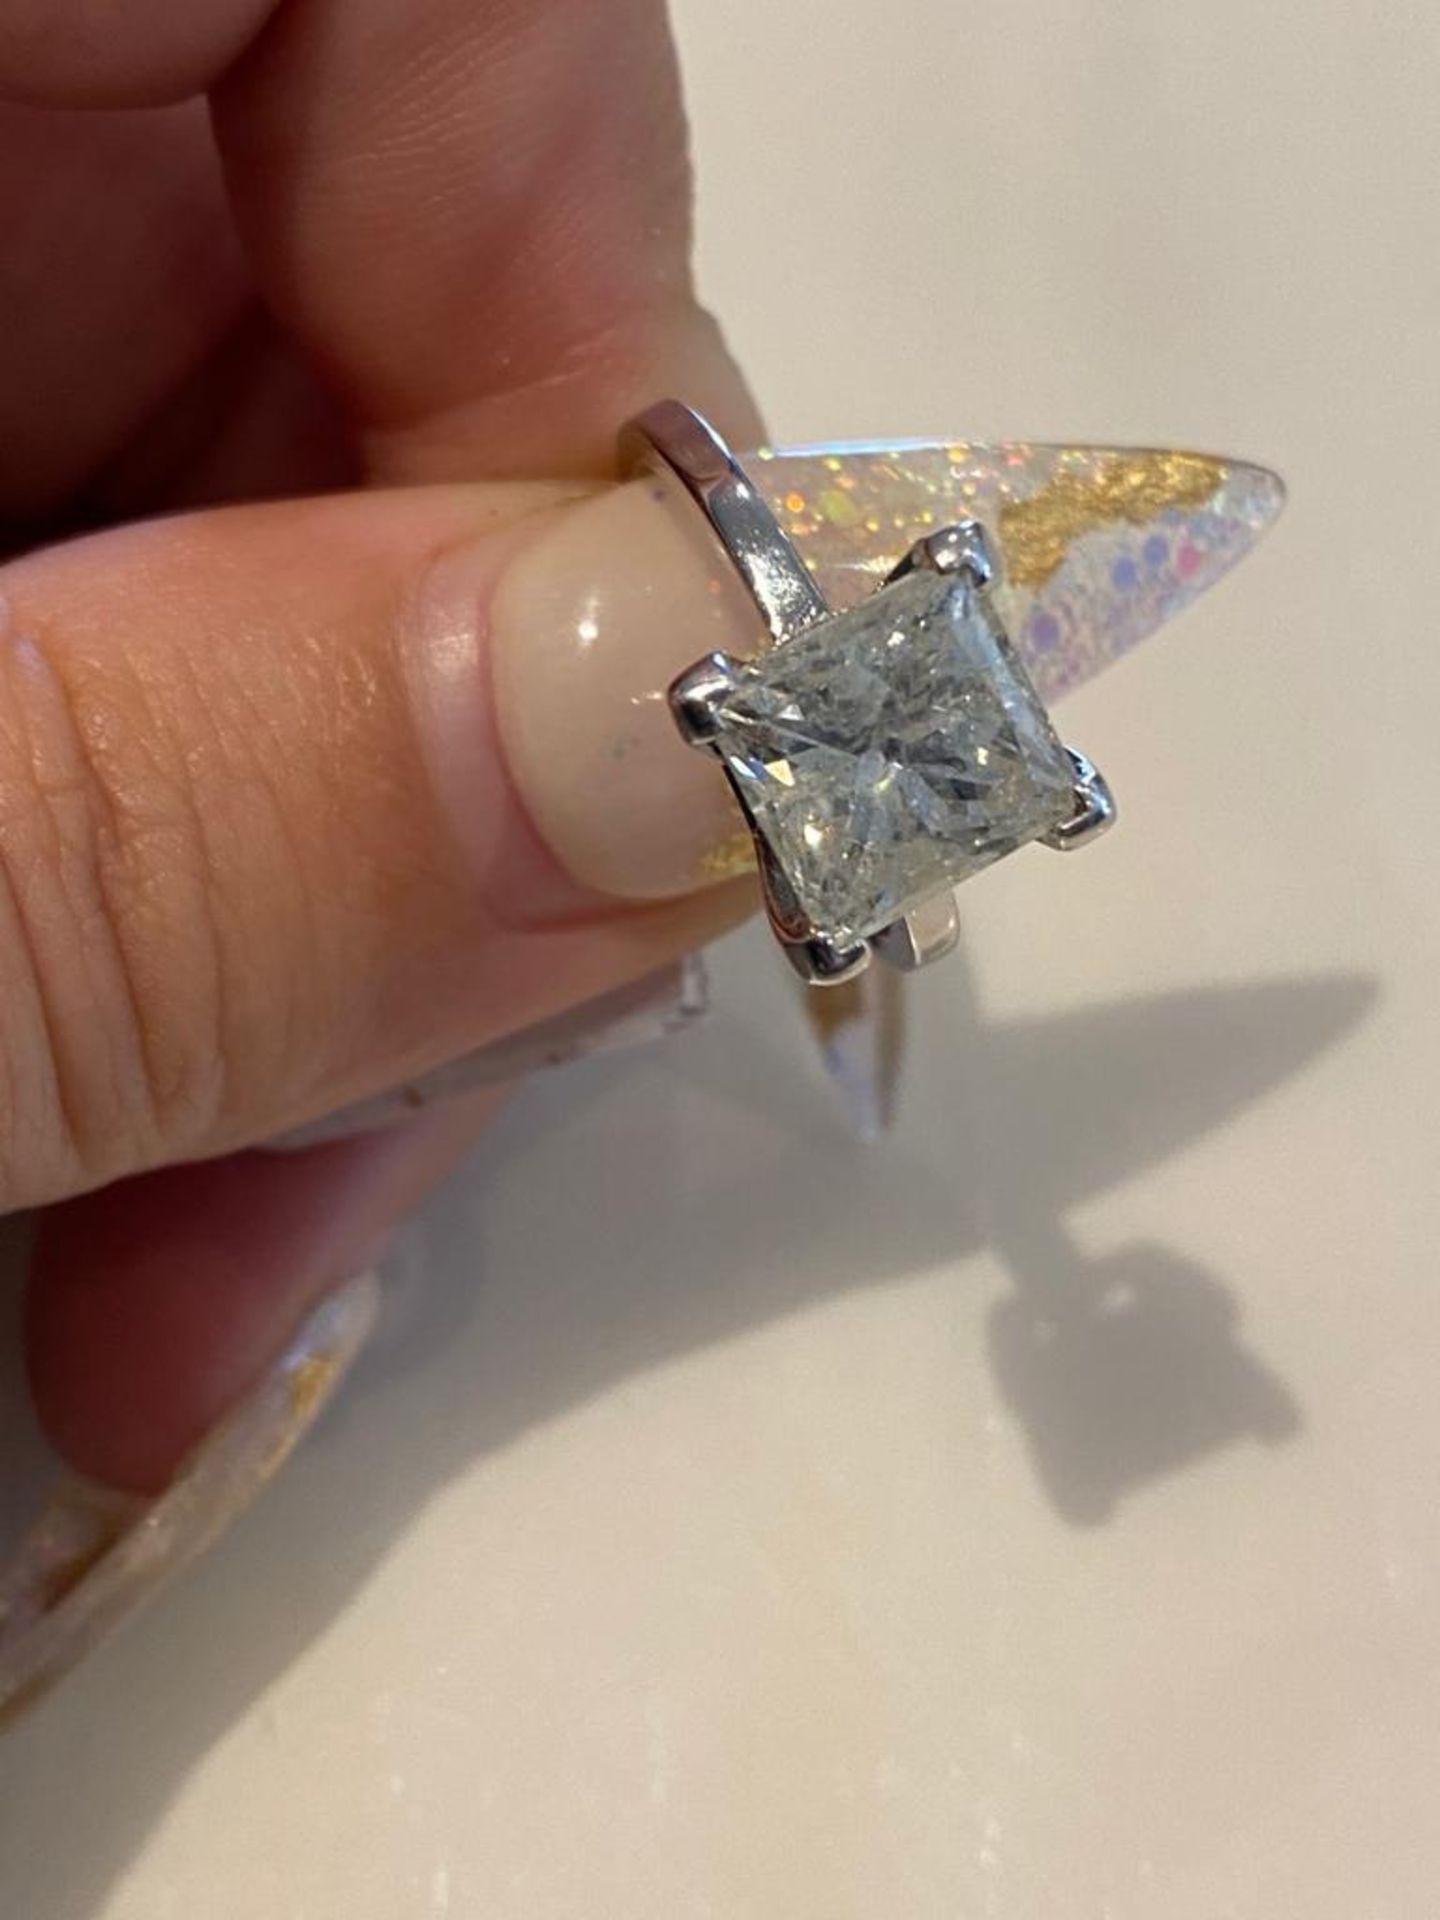 4.03 CT DIAMOND ING PRINCESS CUT - Image 7 of 7